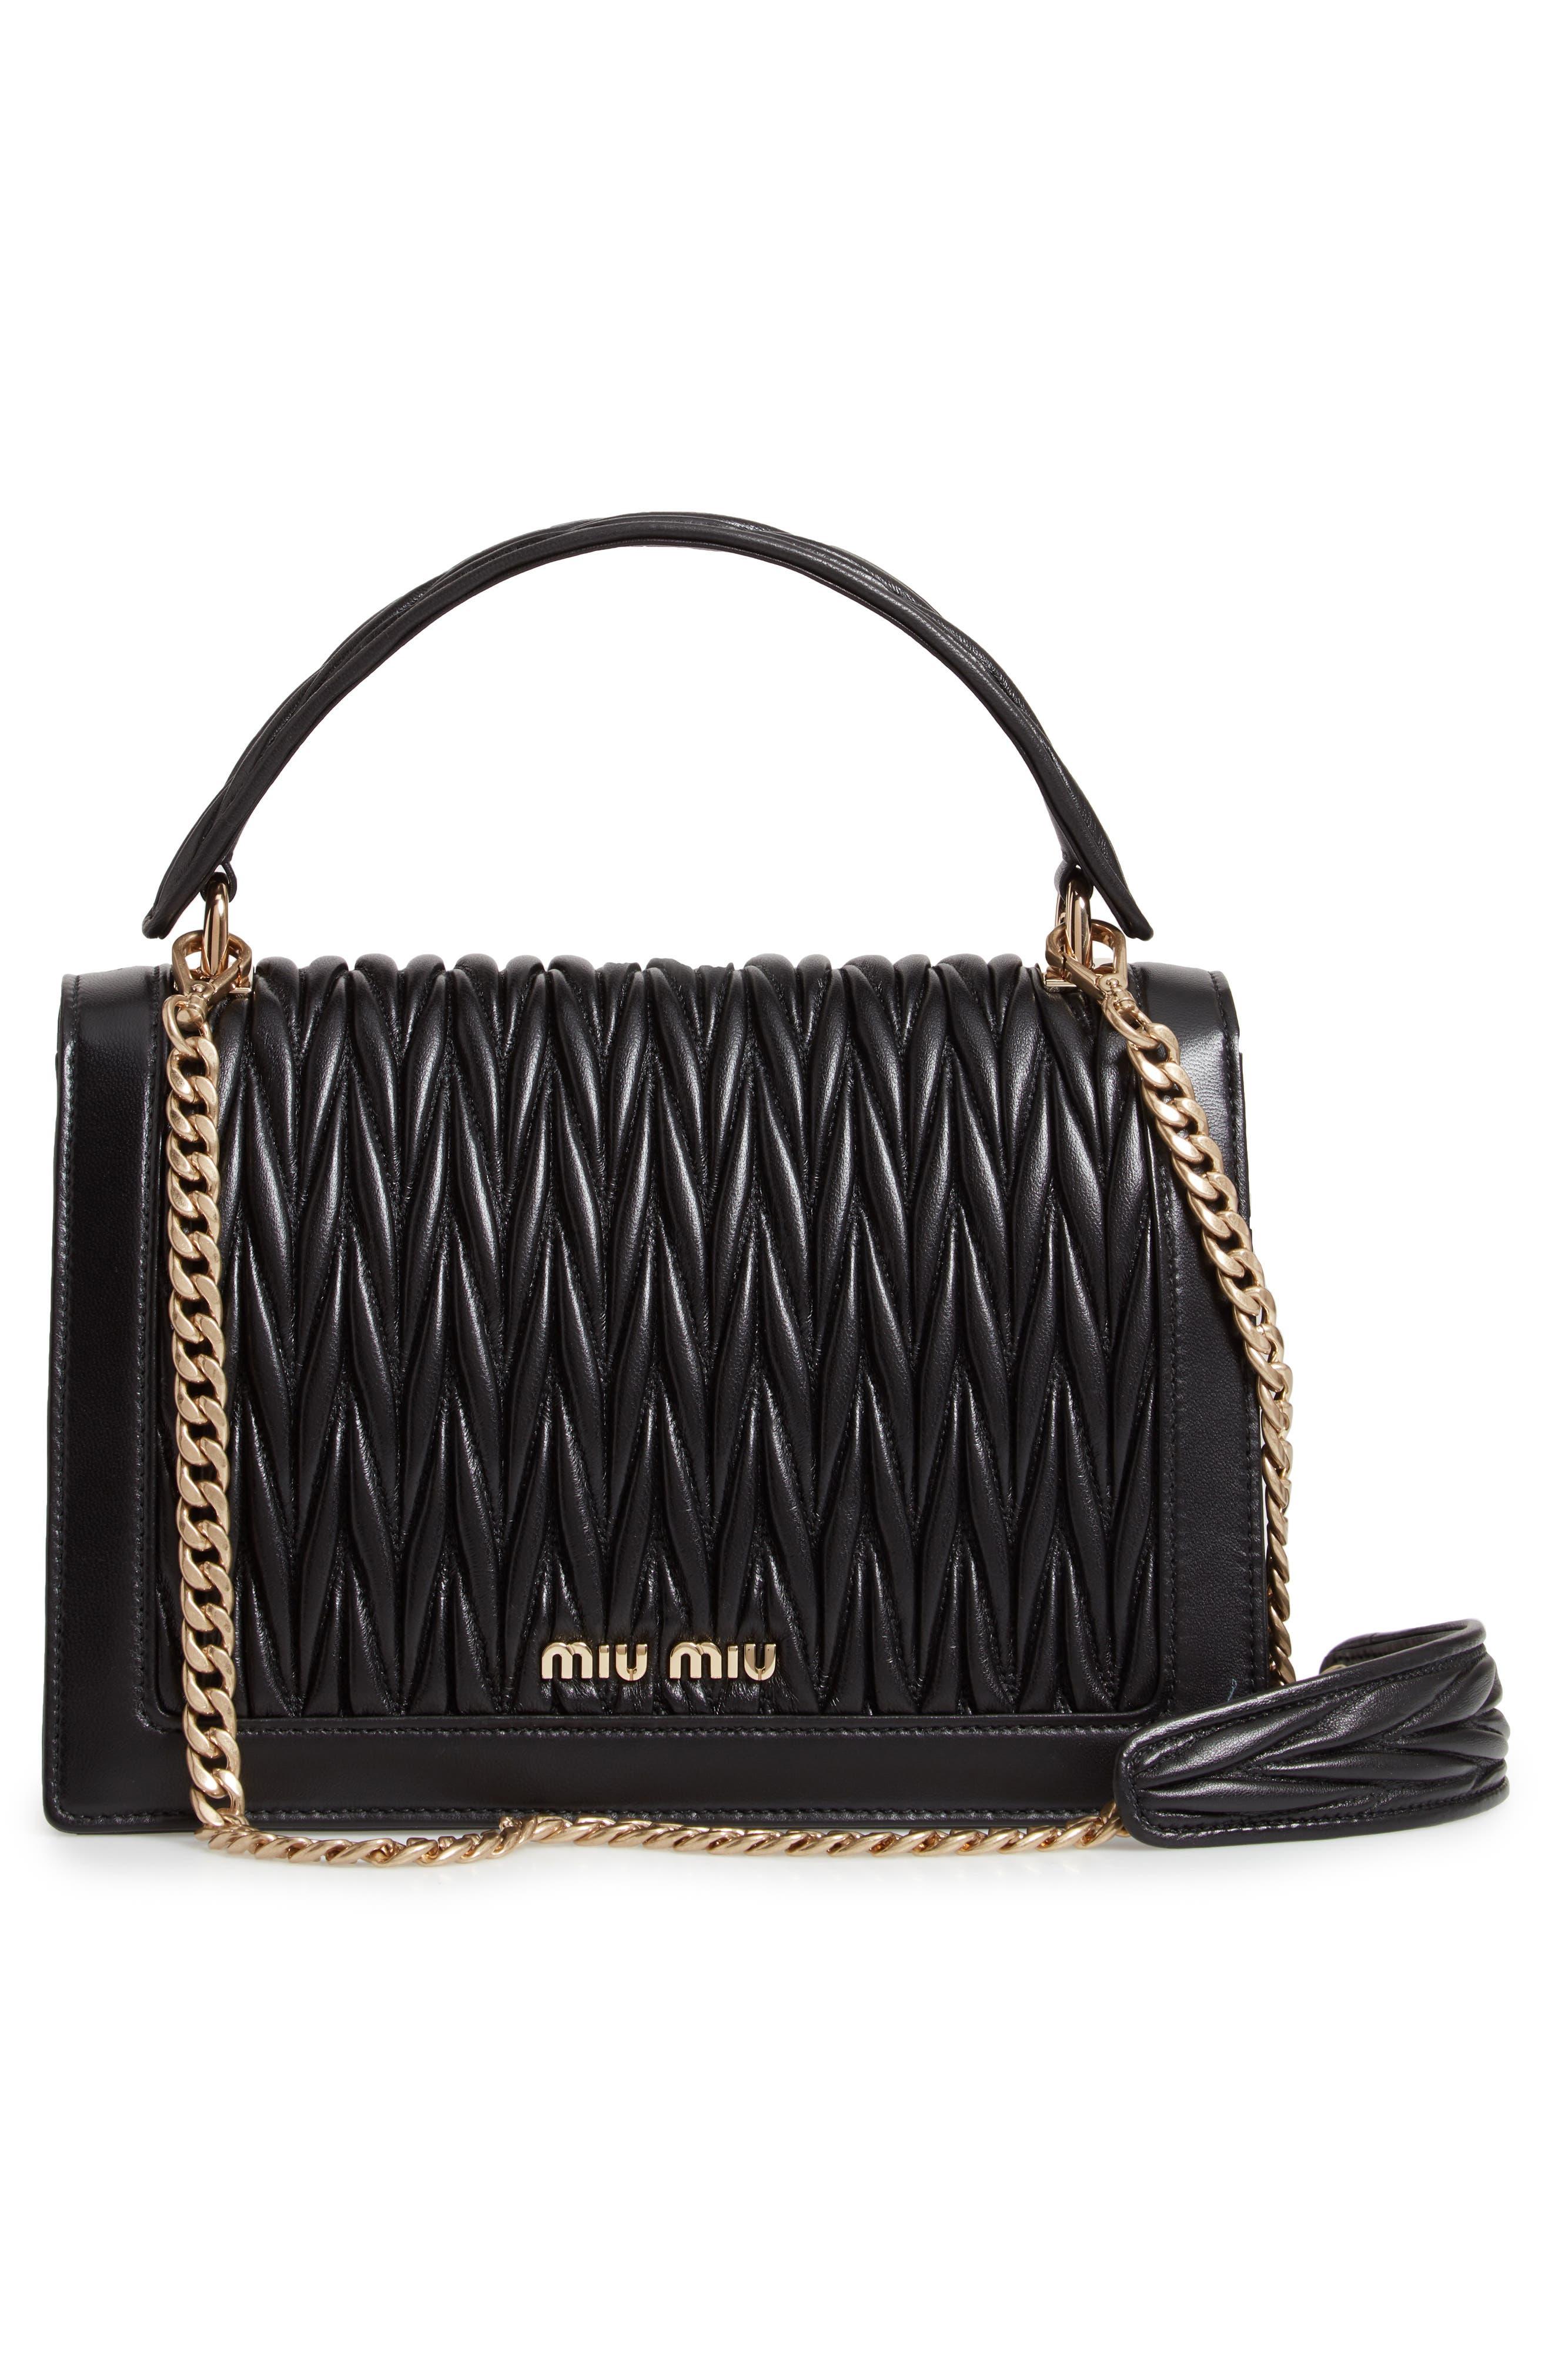 Confidential Matelassé Quilted Lambskin Leather Top Handle Bag,                             Alternate thumbnail 3, color,                             NERO